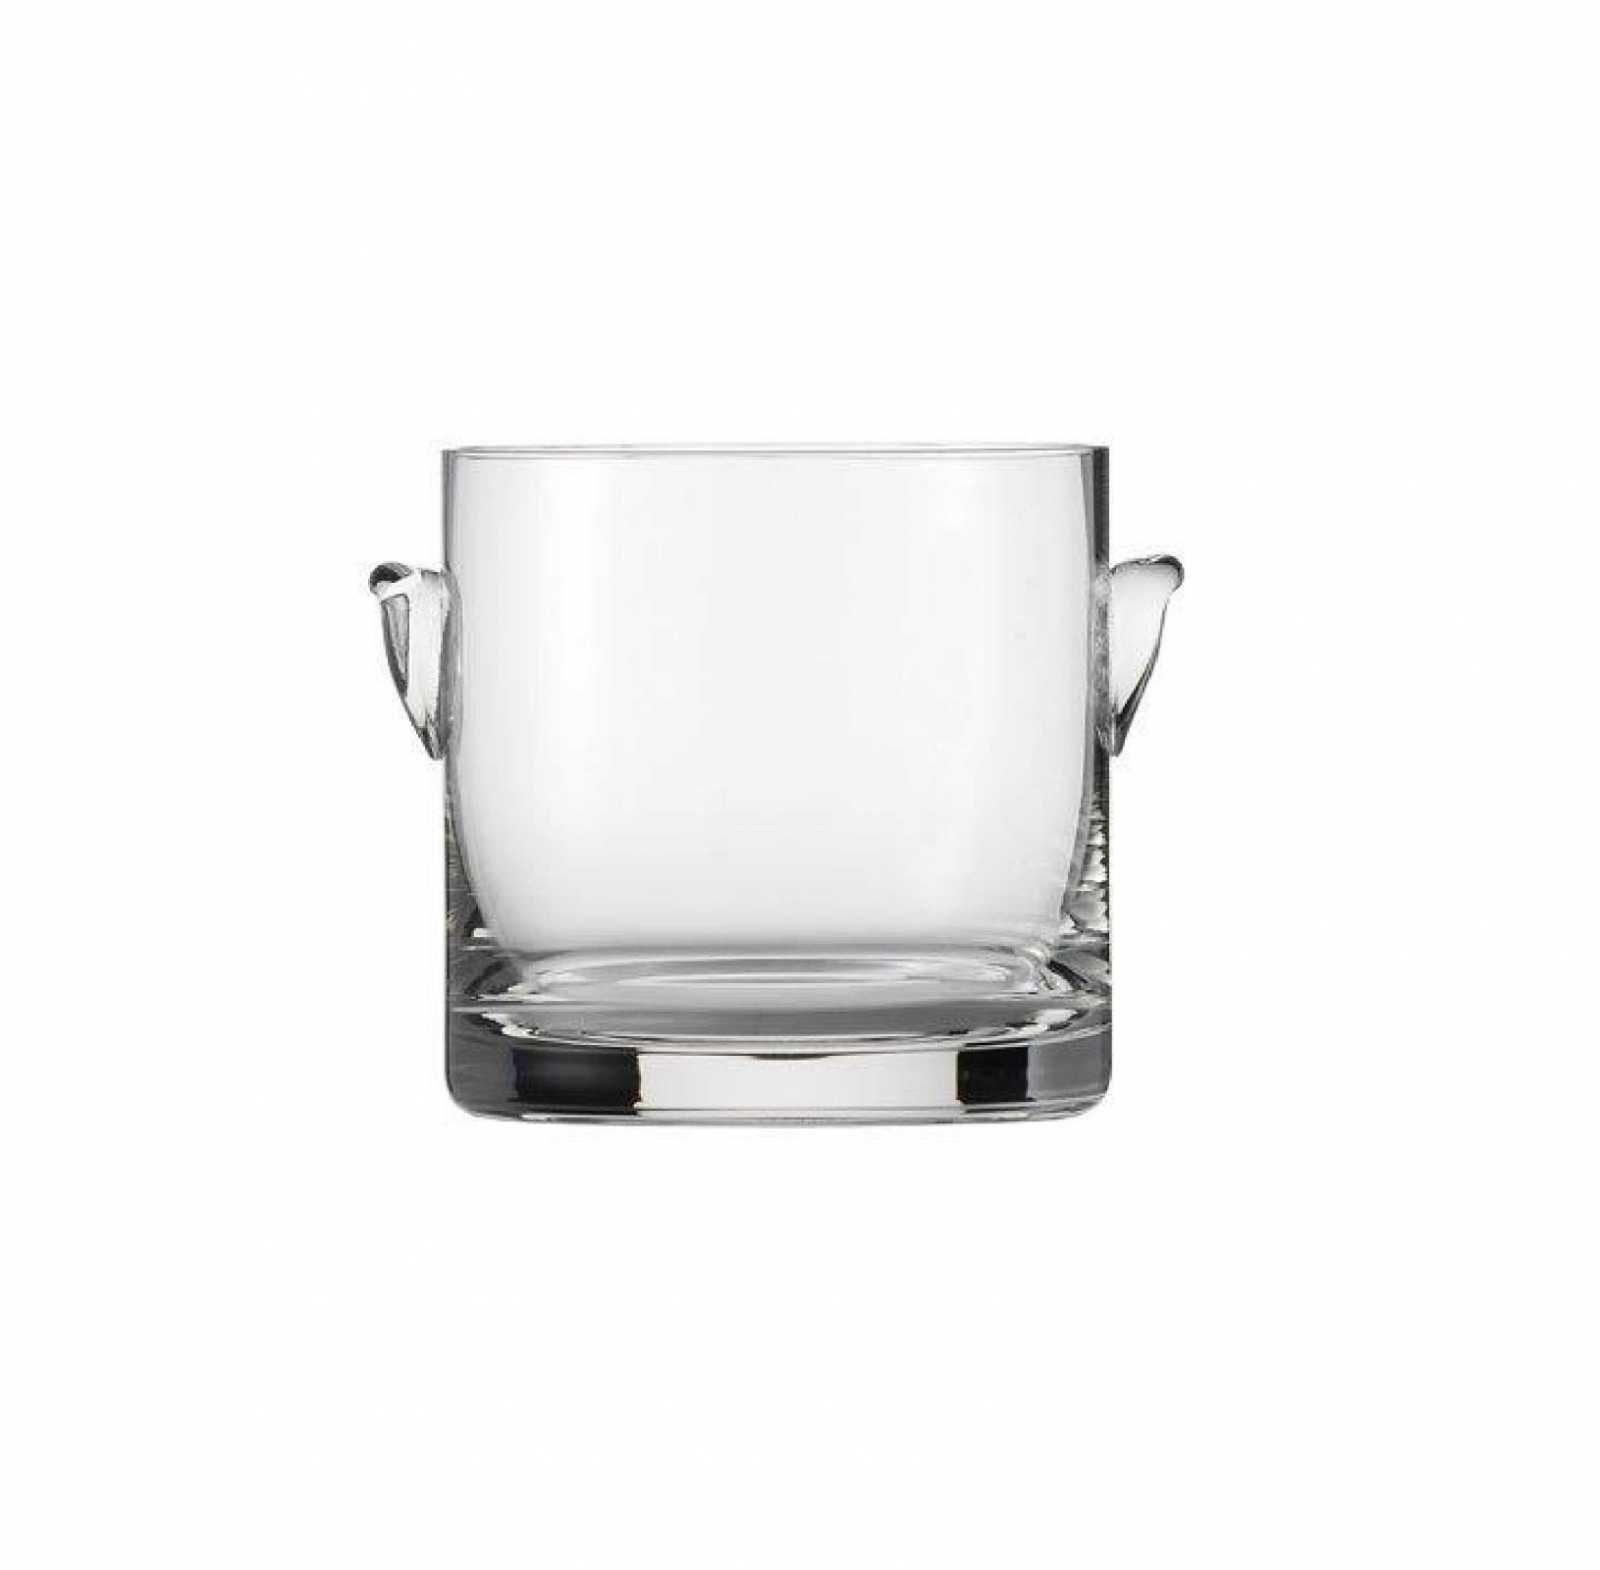 Ведерко для льда Schott Zwiesel Bar Special, прозрачный Schott Zwiesel 112713 фото 1